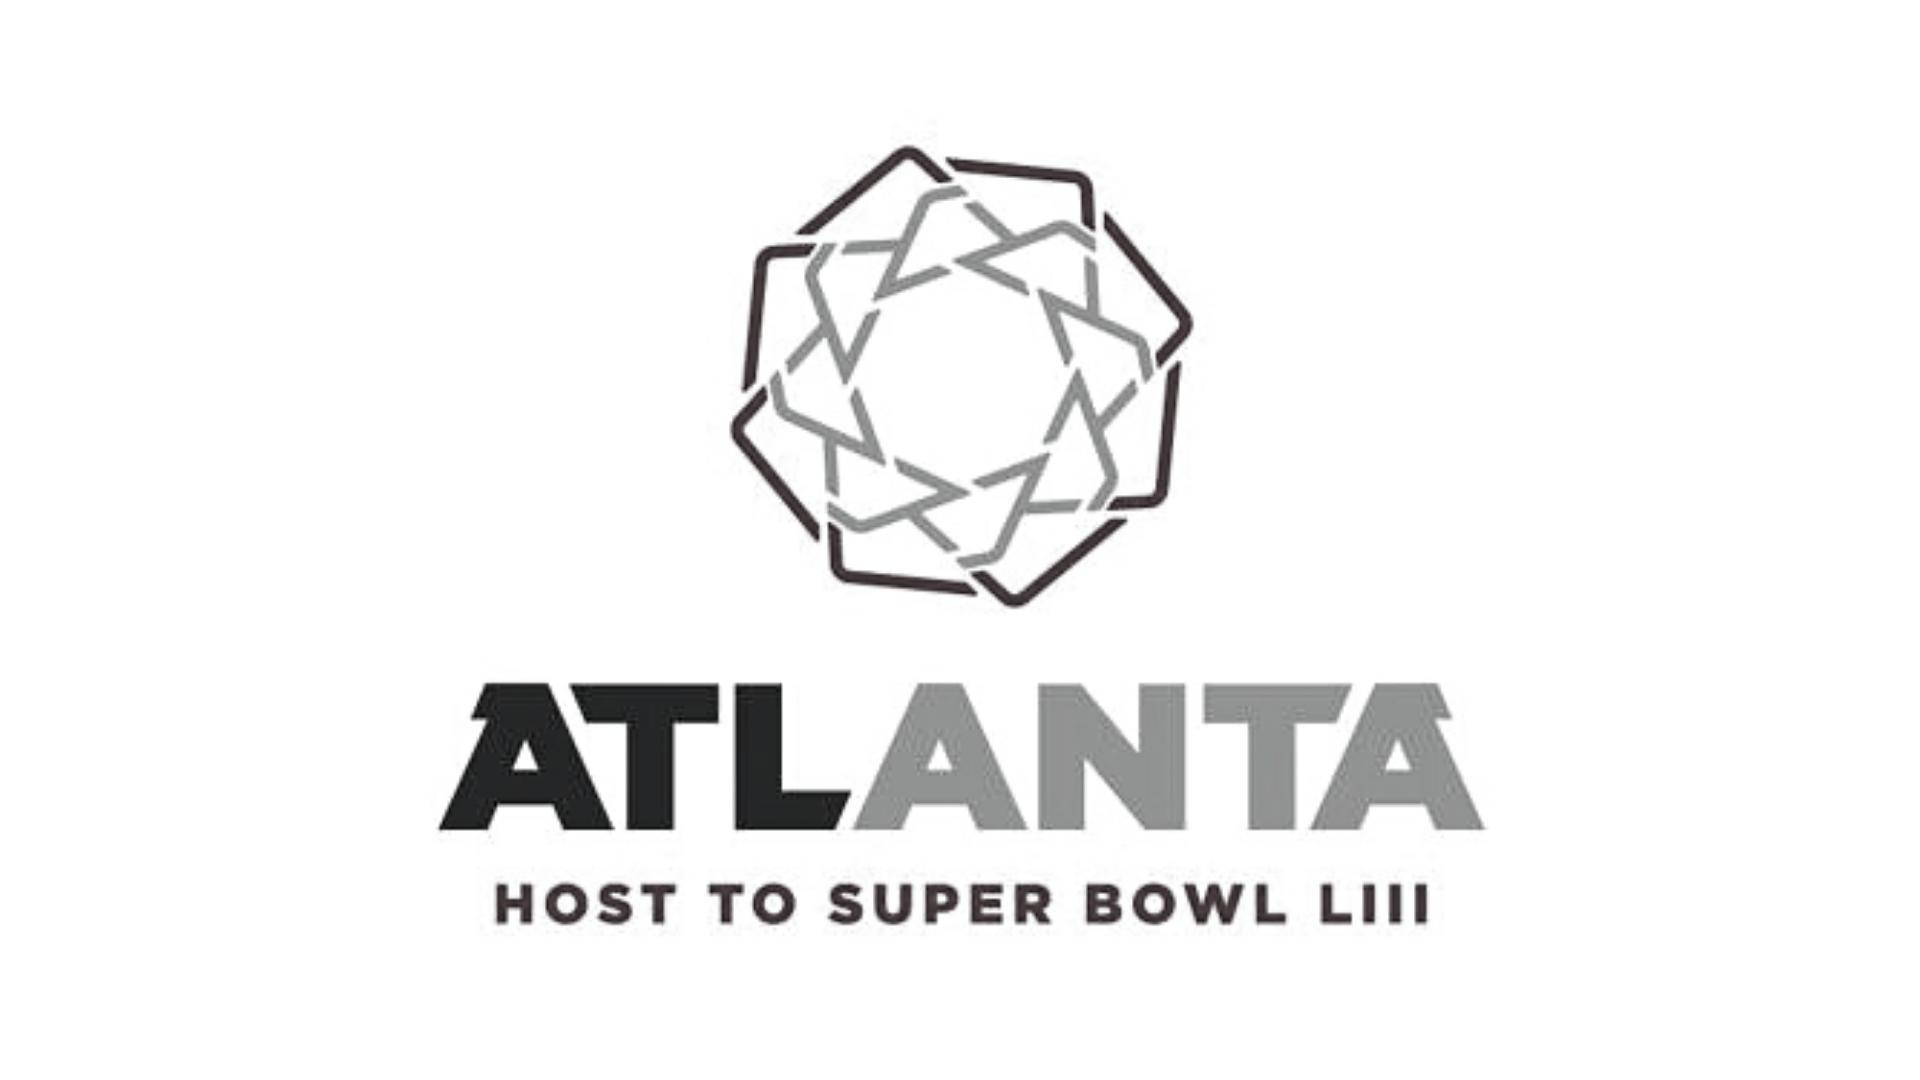 Atlanta Super Bowl_Rosterfy Case Study